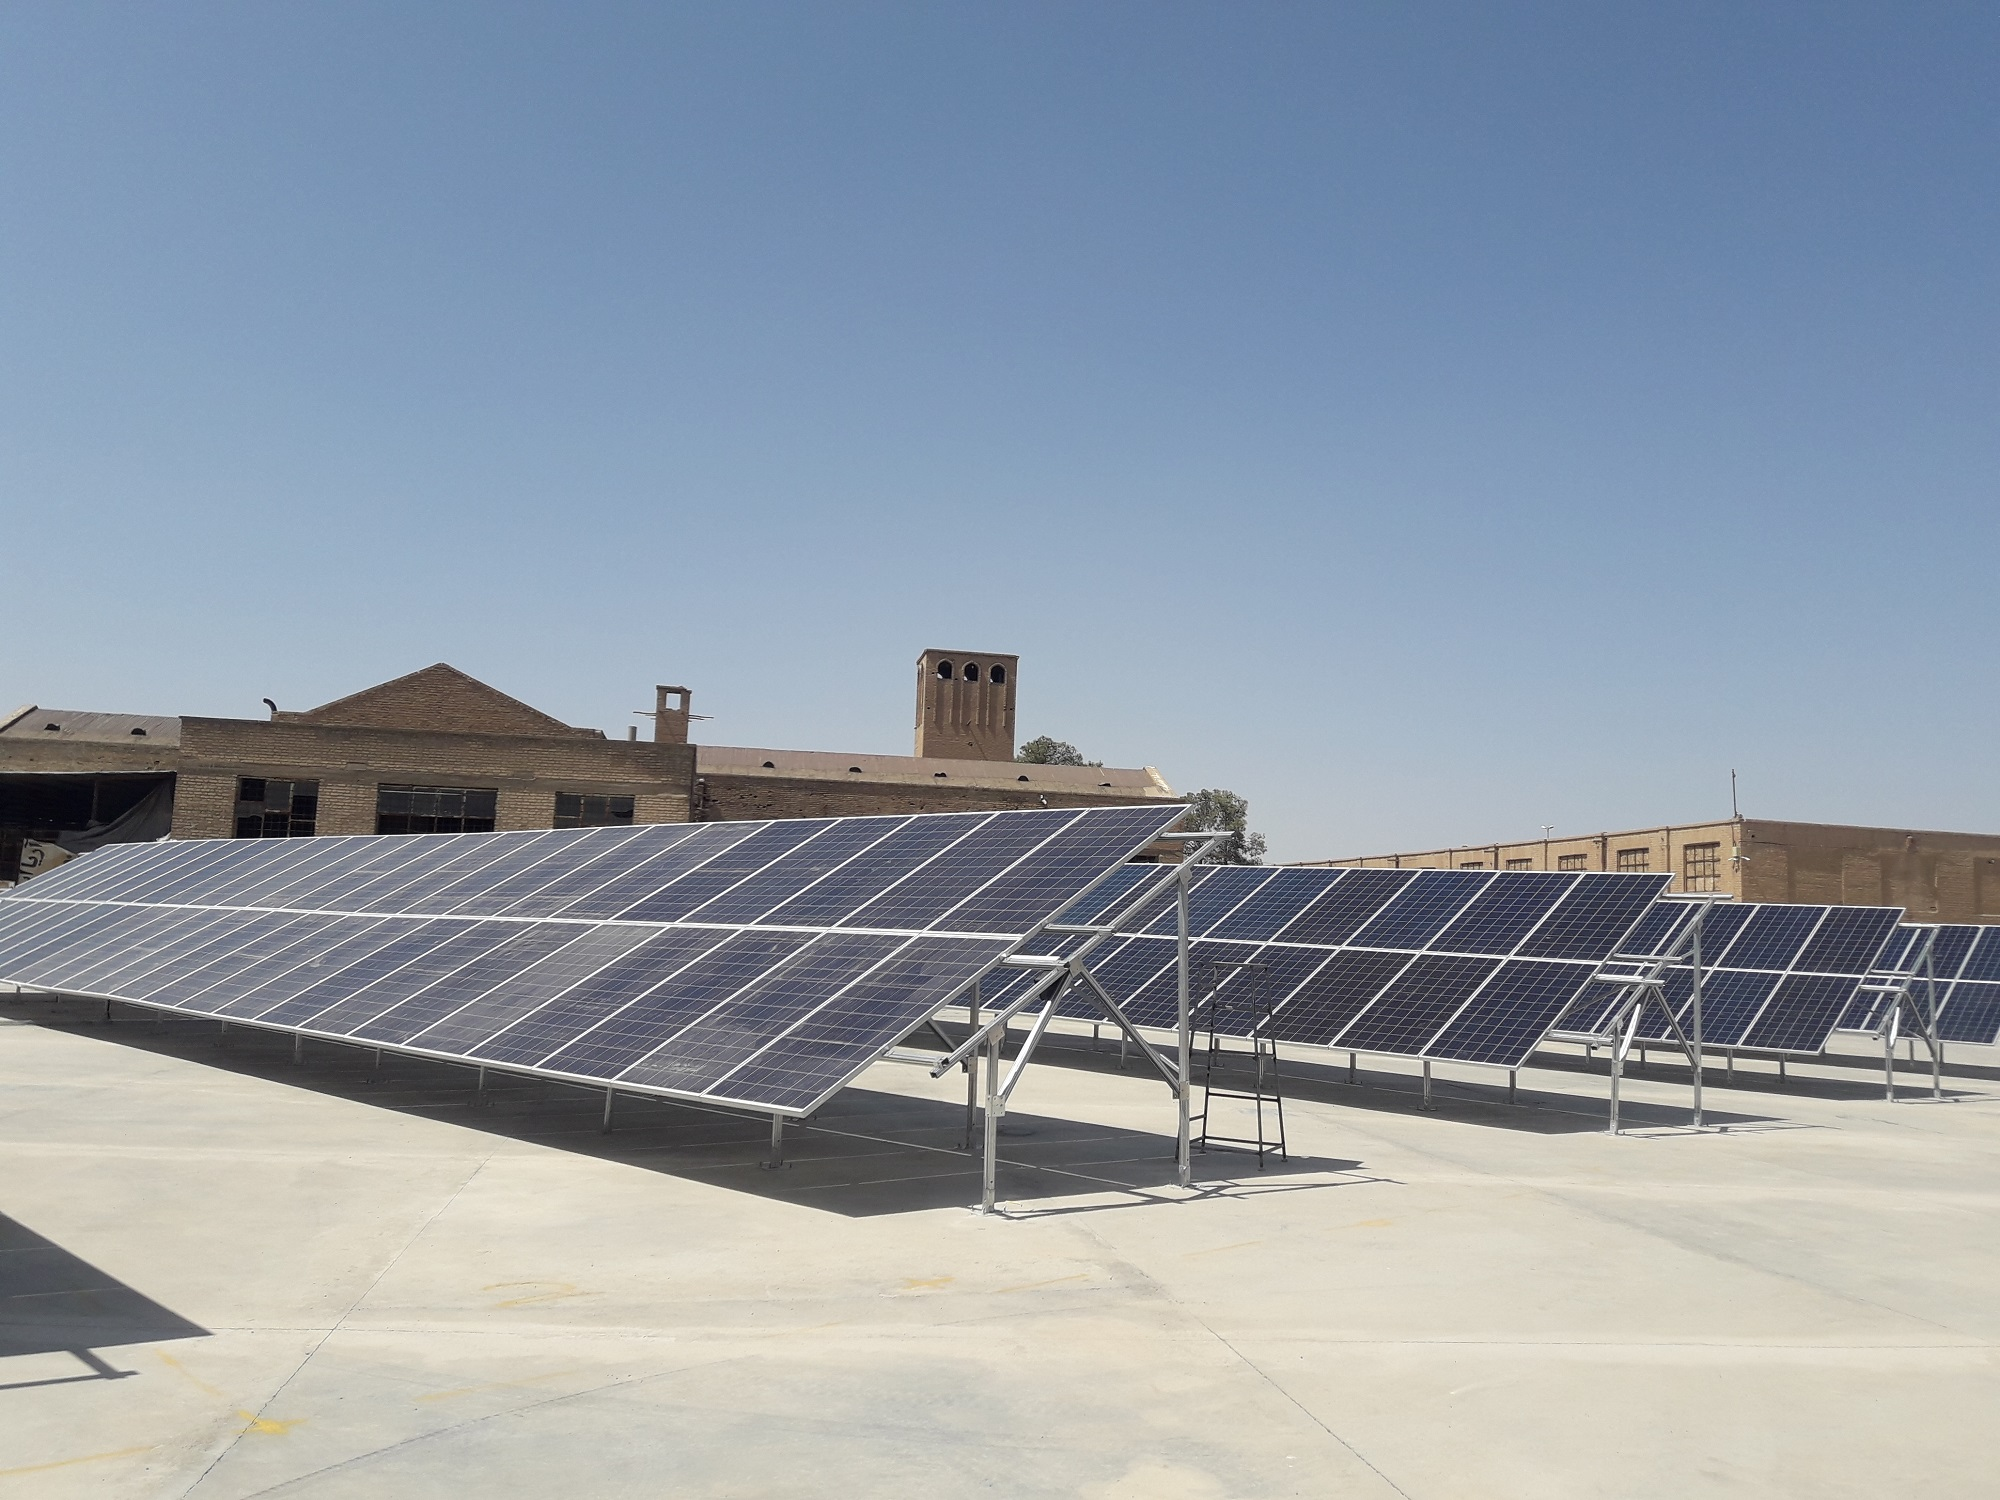 نیروگاه خورشیدی کارخانه یخ استان قم